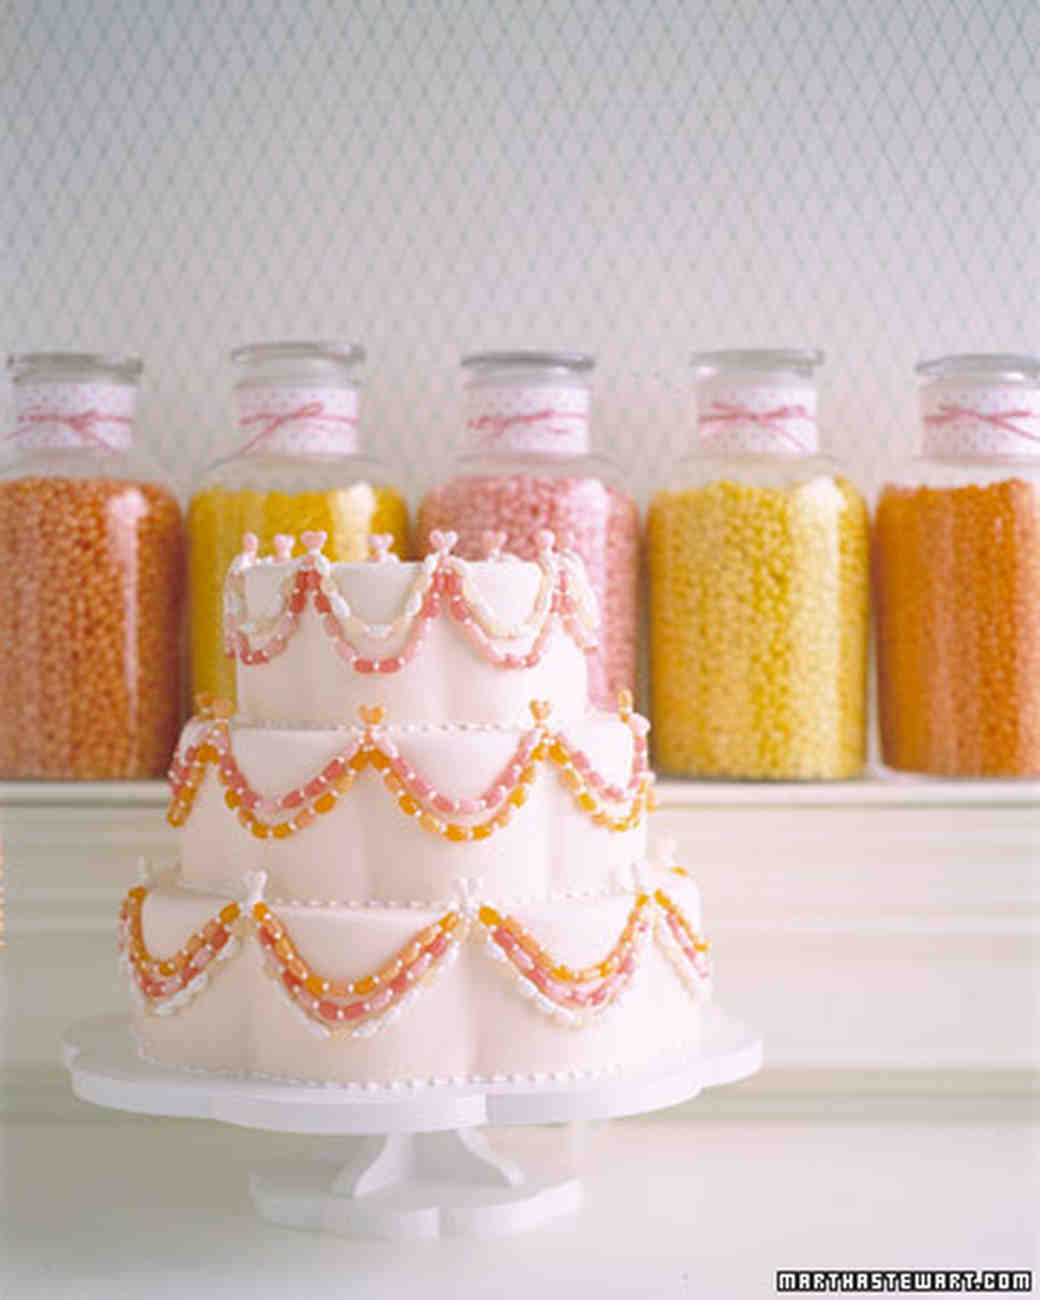 Jelly Bean Jewel Box Cake